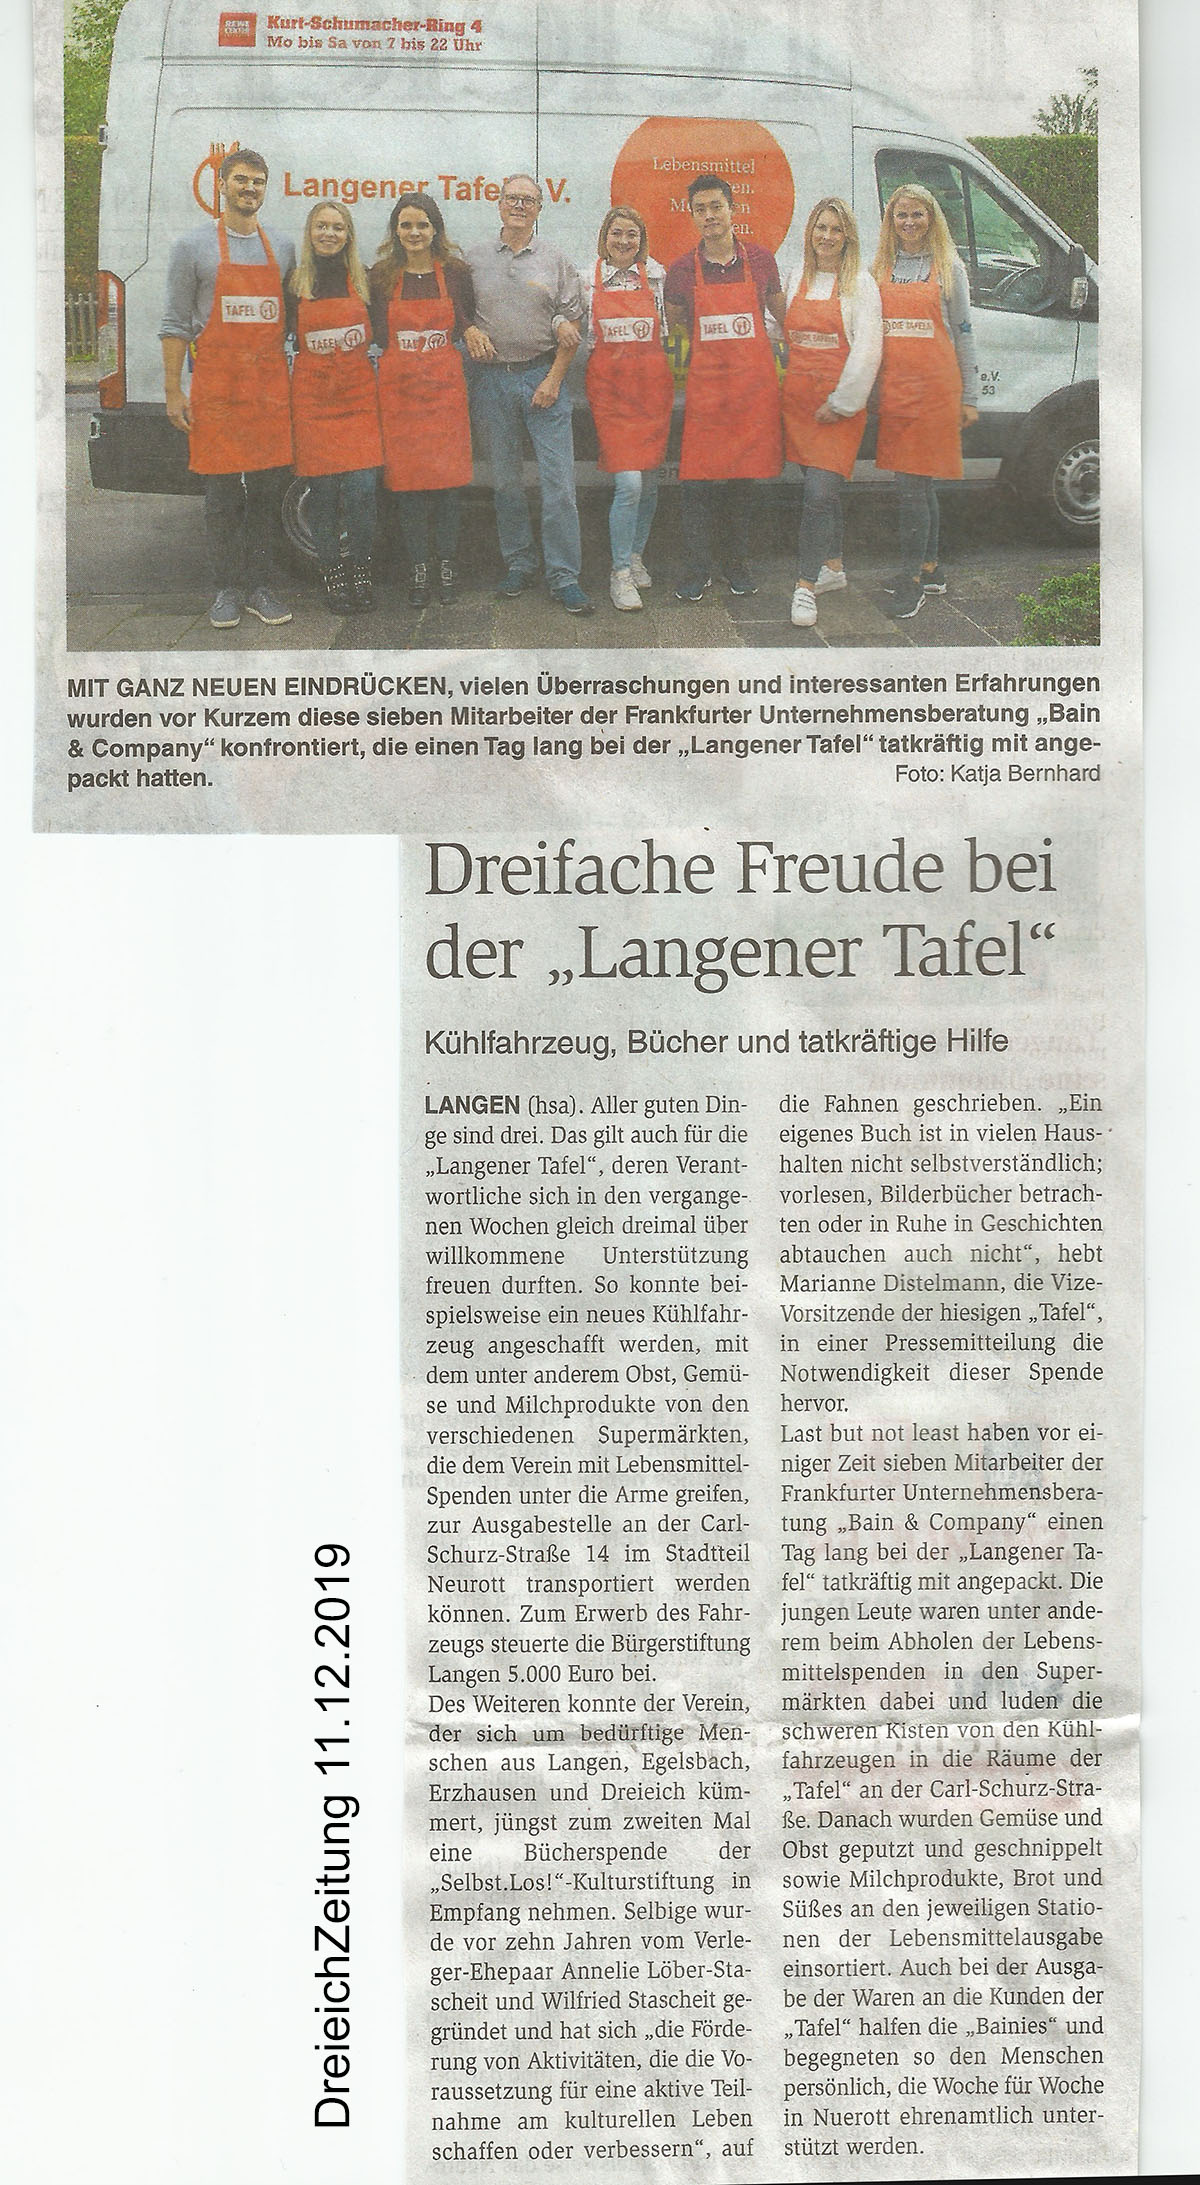 langener-tafel-bain-company-frankfurt-dreieich-zeitung-20191211-web